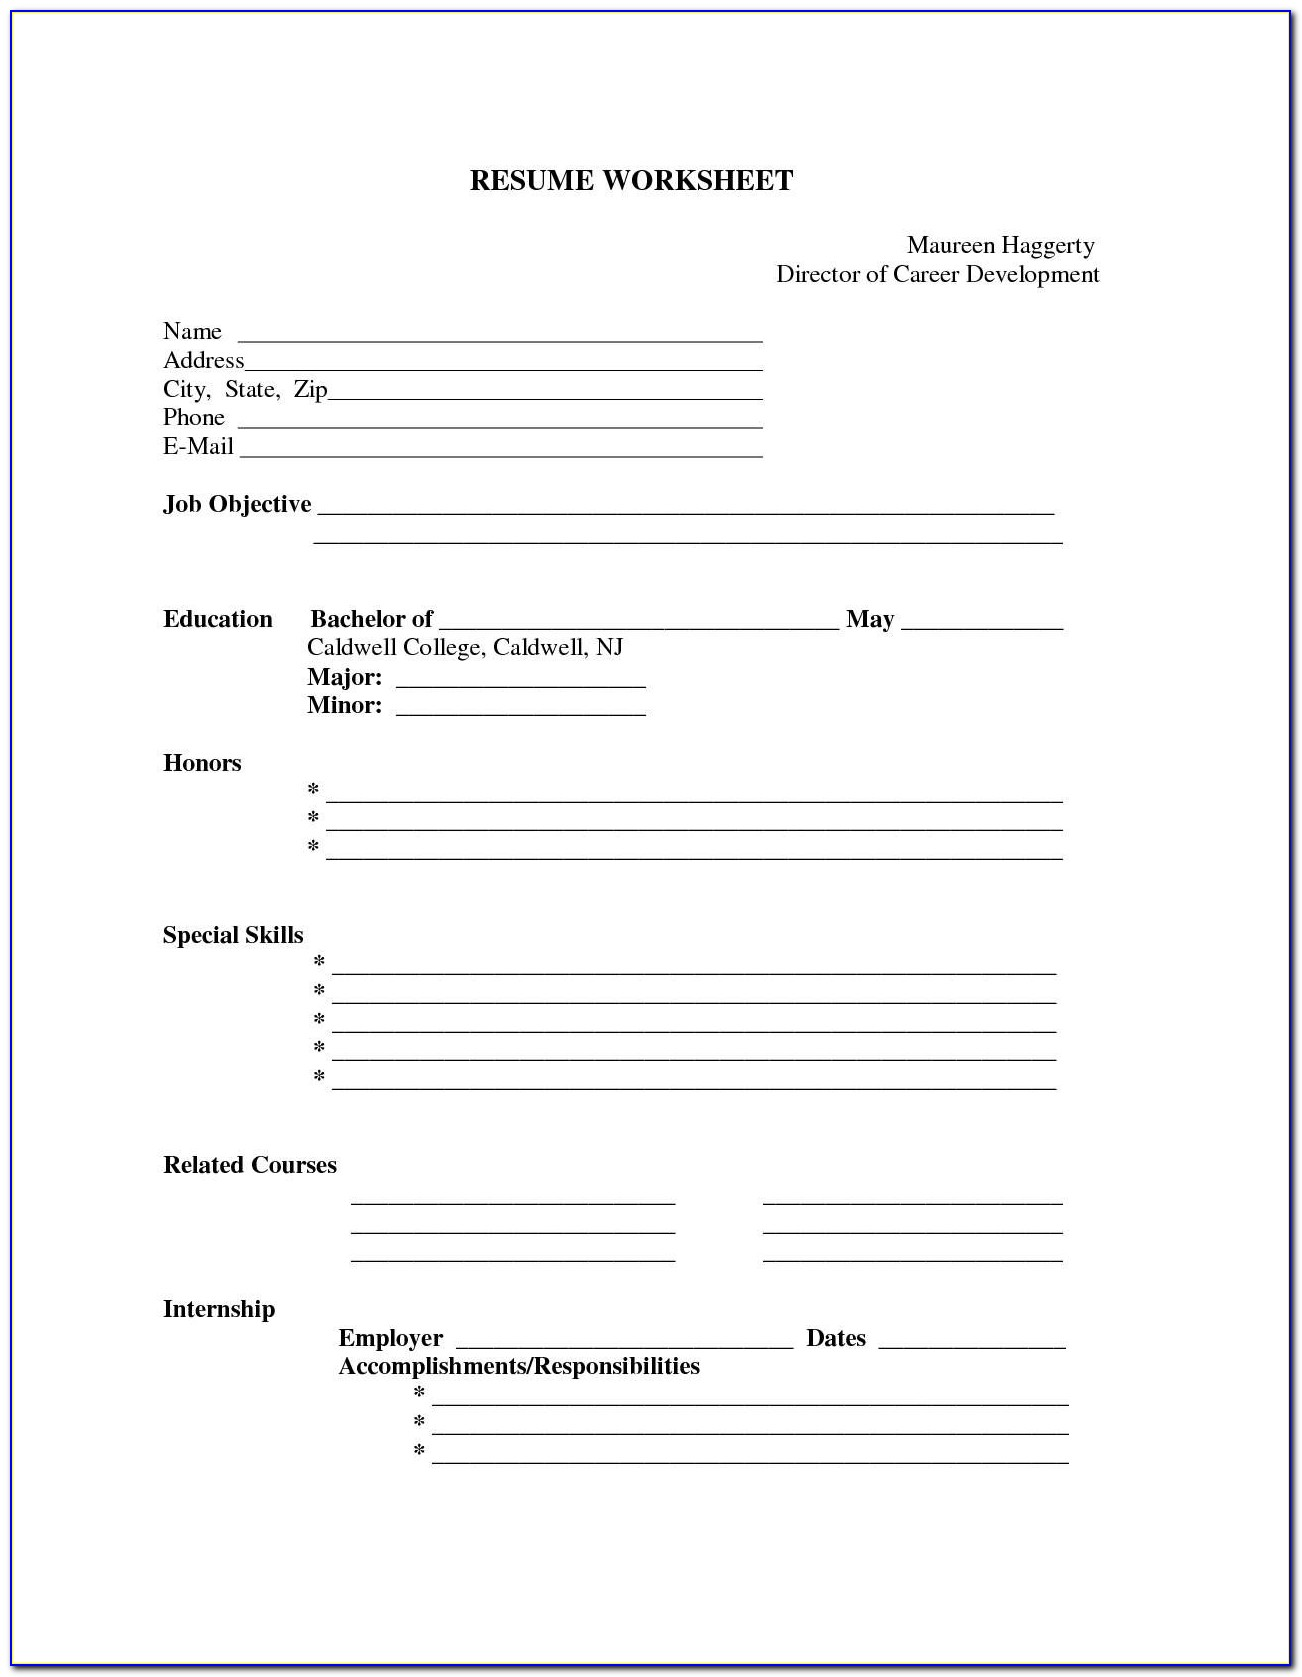 Resume Sample Blank Form